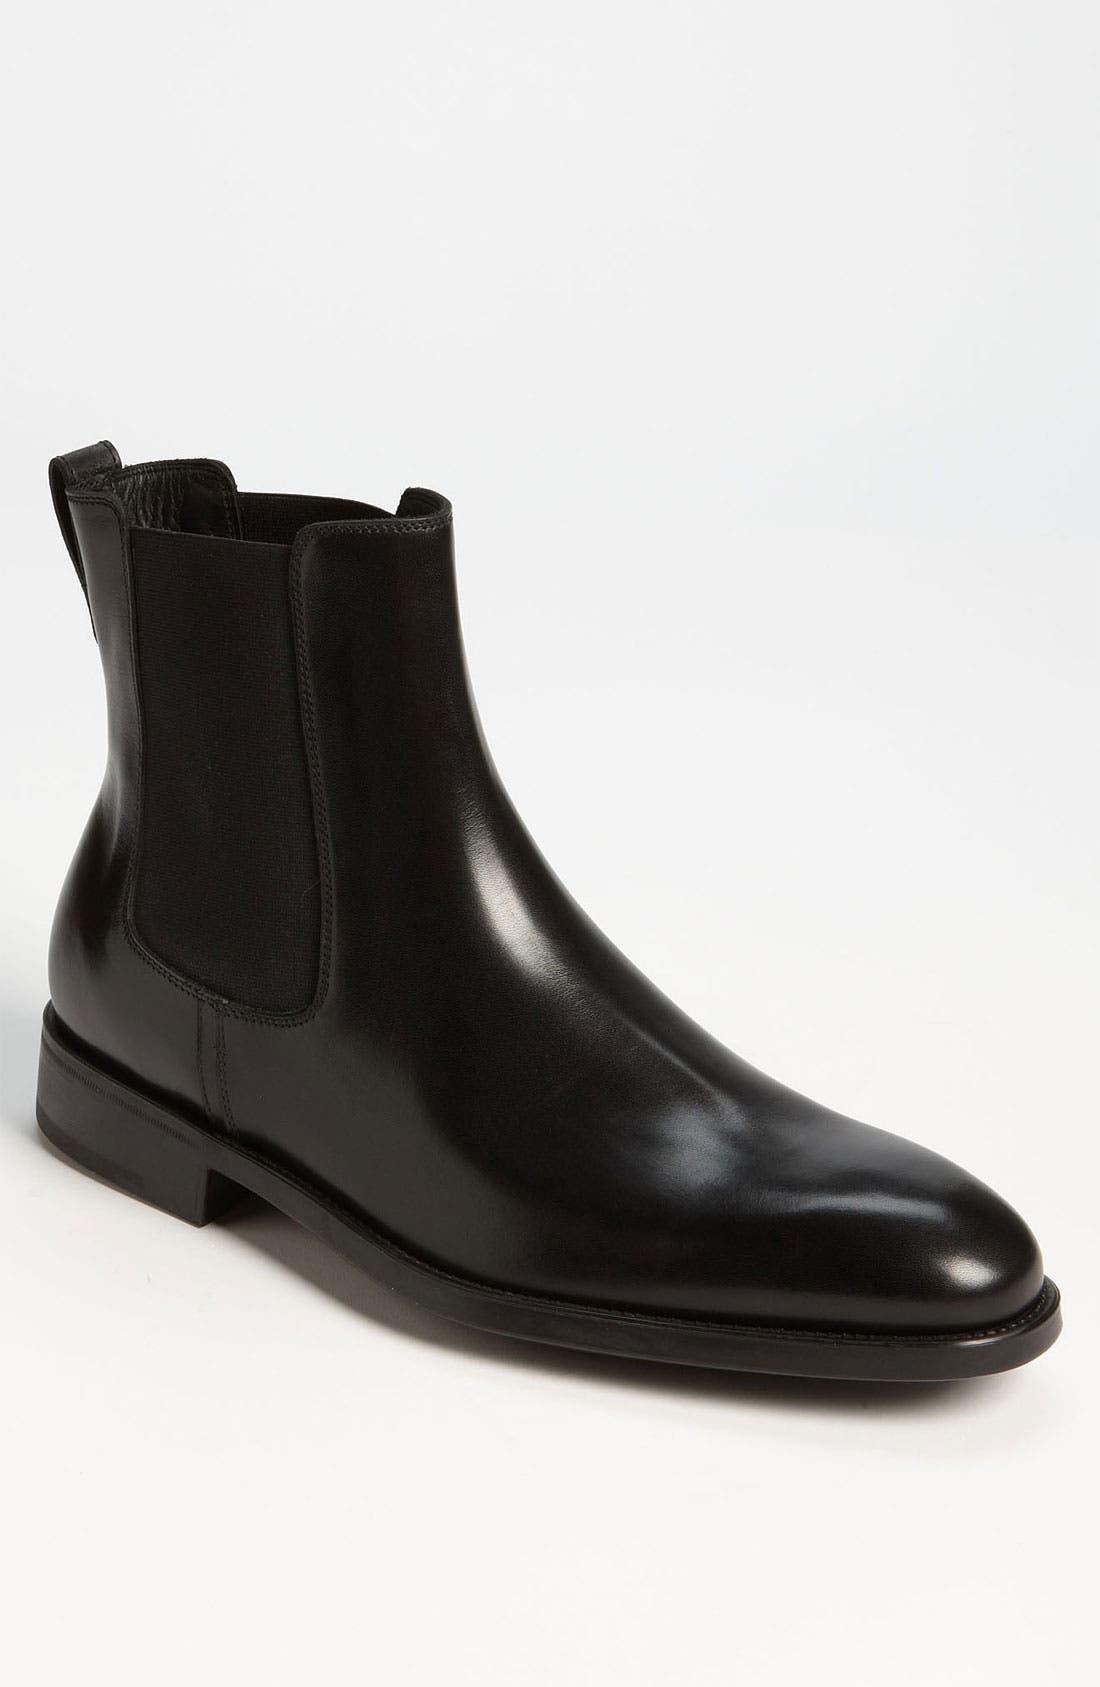 Alternate Image 1 Selected - Salvatore Ferragamo 'Arden' Chelsea Boot (Online Only)